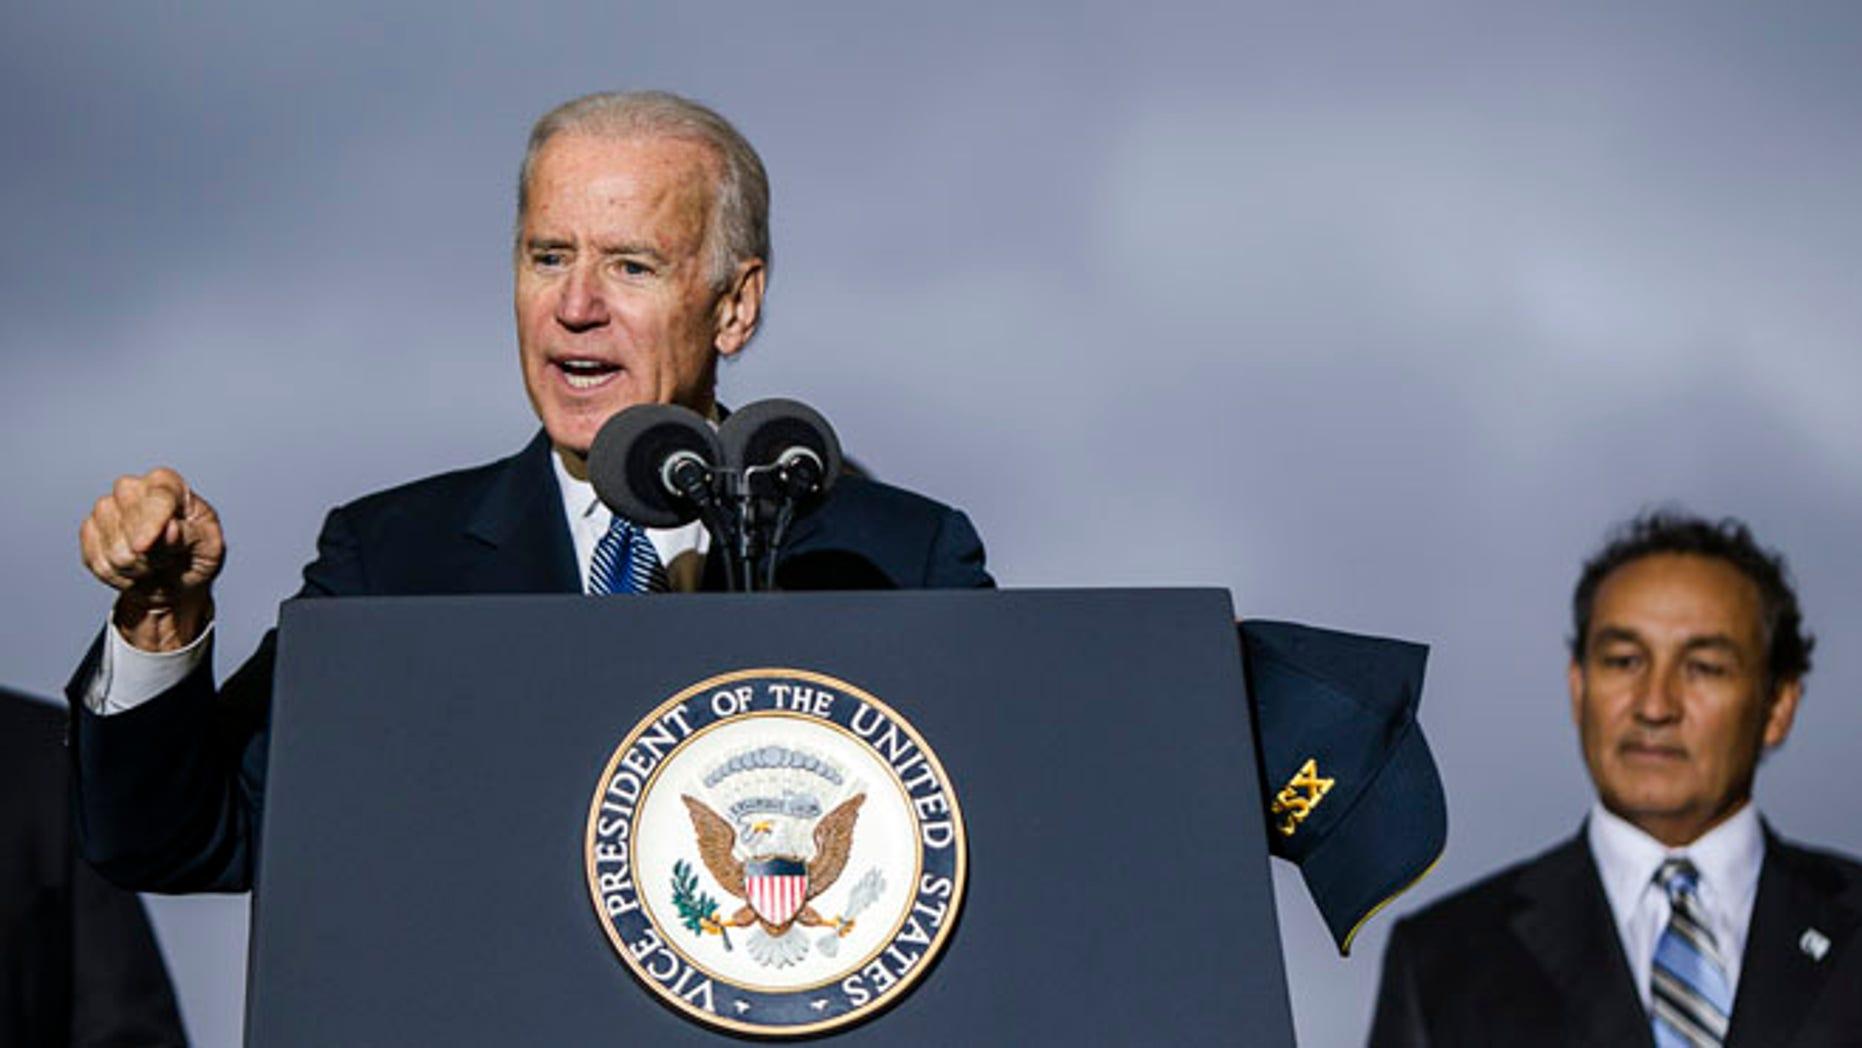 Vice President Joe Biden addresses an audience, Wednesday, Nov. 6, 2013, at the CSX Northwest Ohio Intermodal Terminal in North Baltimore, Ohio.